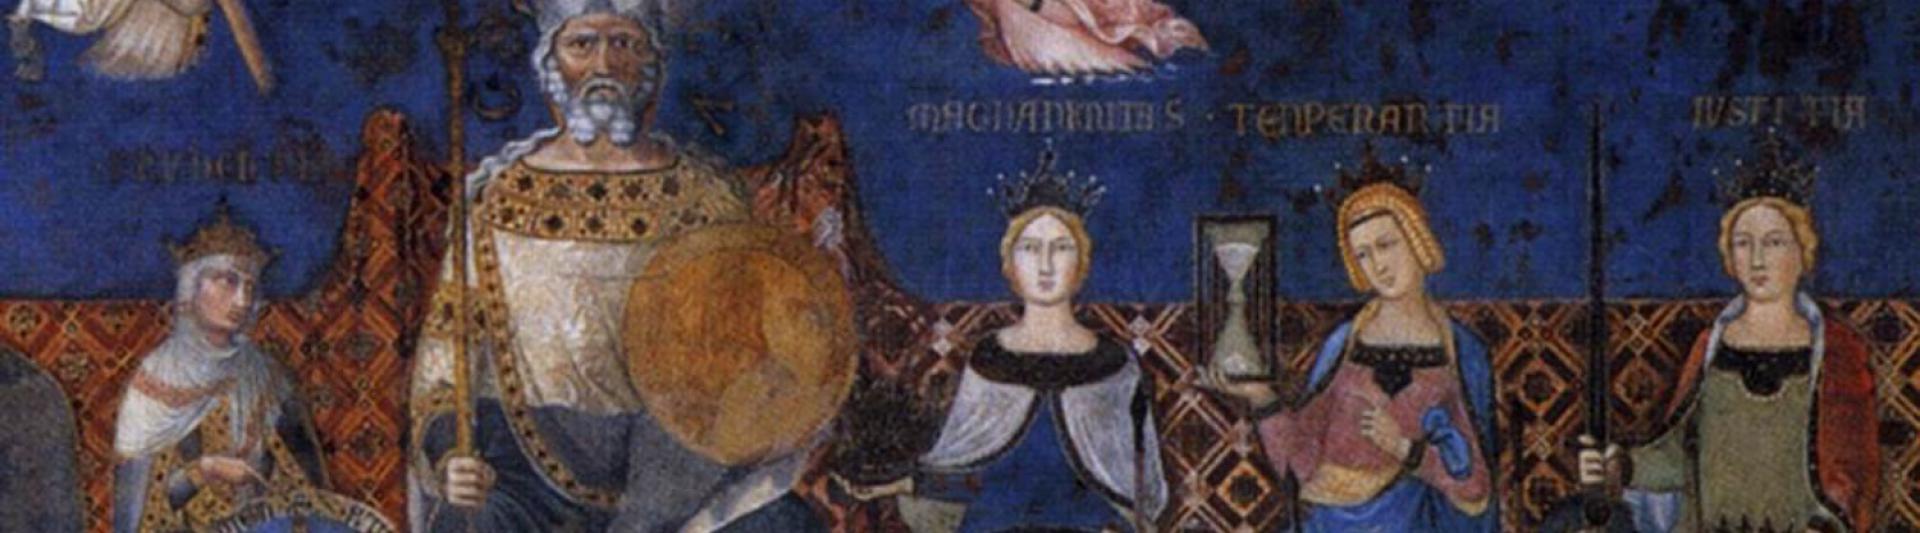 Ambrogio_Lorenzetti Allegorie op goed bestuur